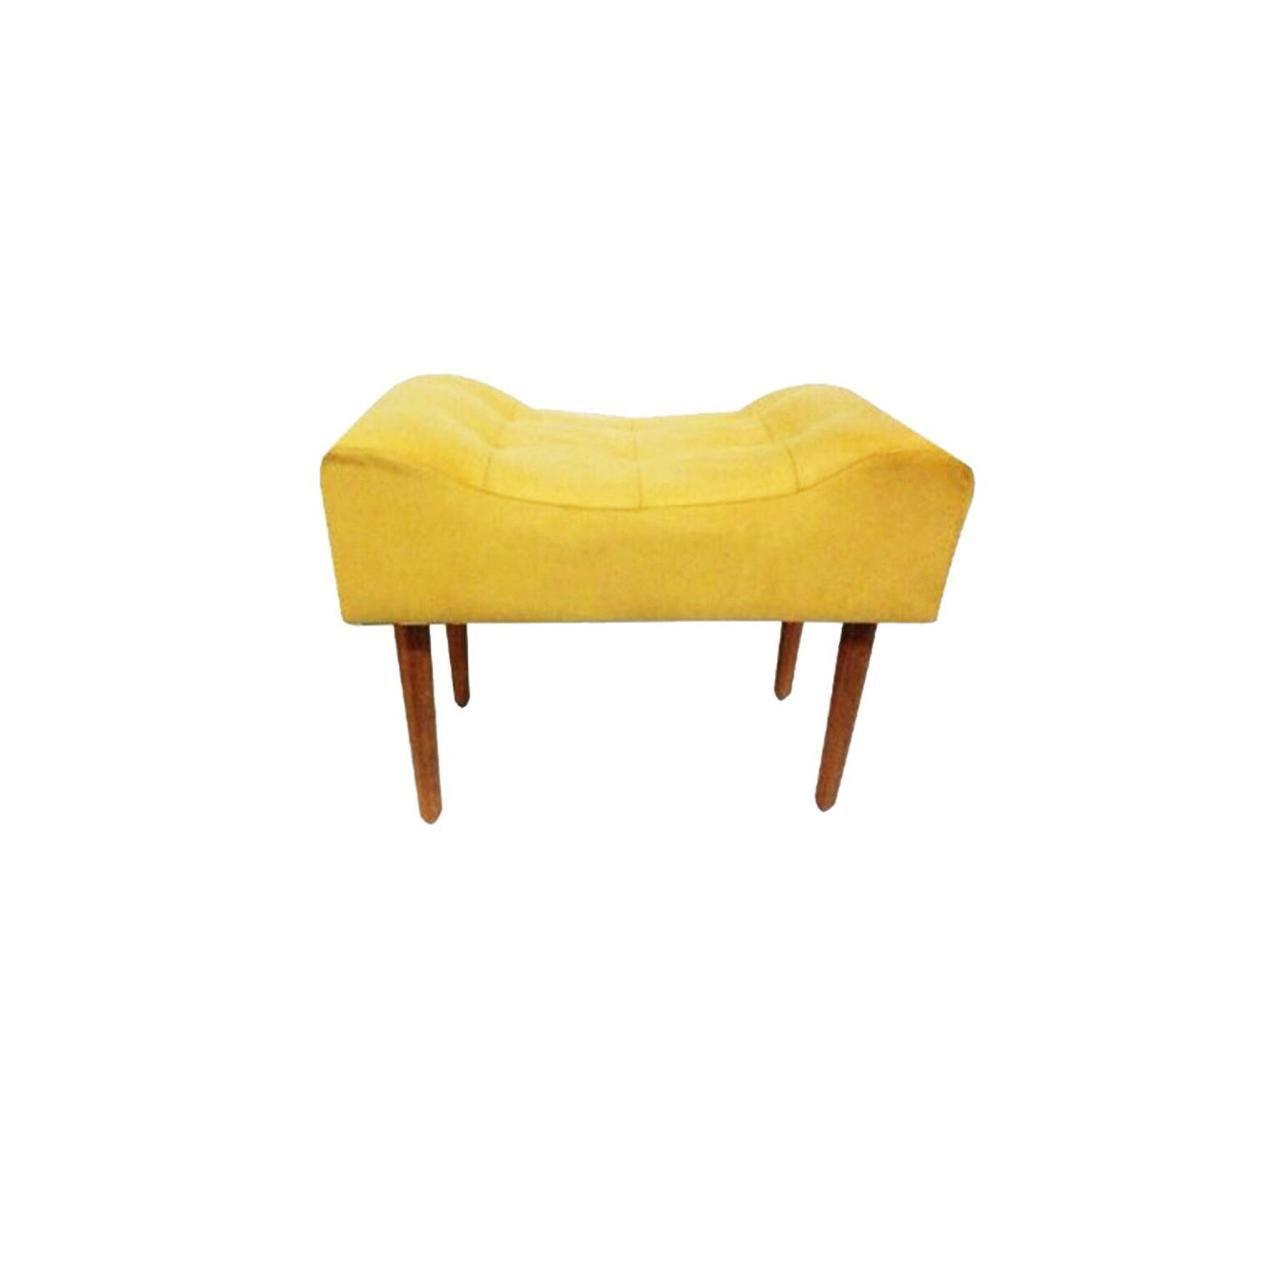 Kit 02 Poltrona Decorativa Nina com rodapé e Puff retangular Amarelo - Bela Casa Shop